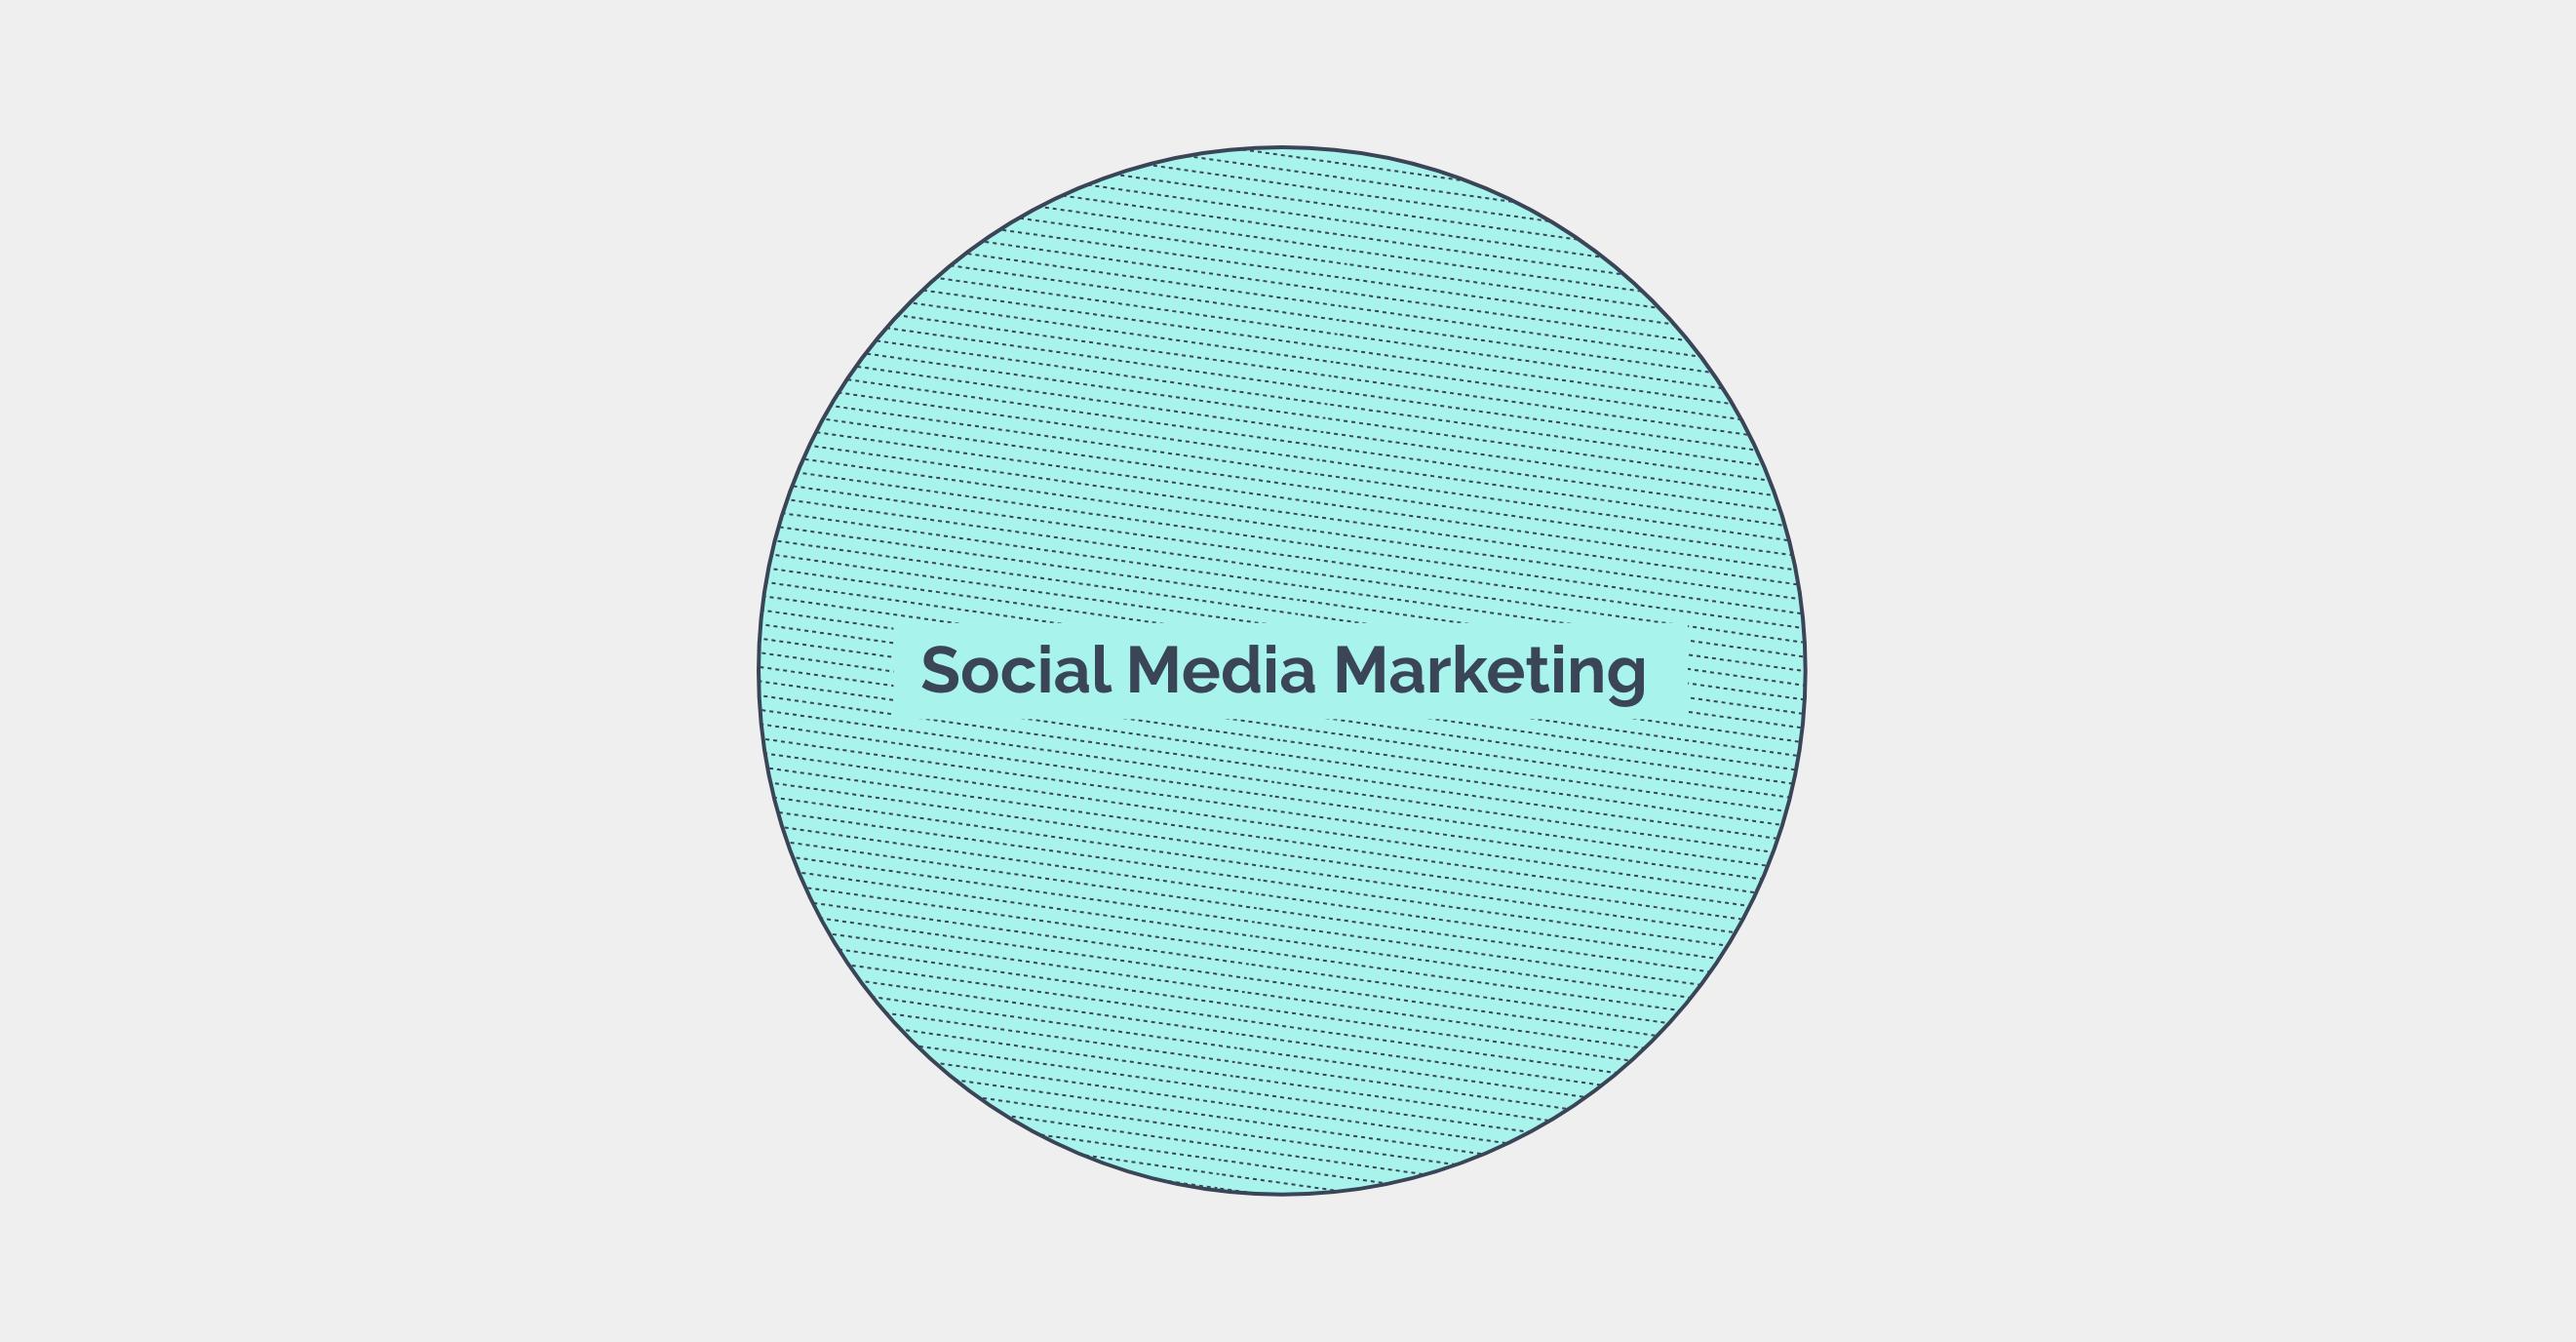 Social Media Marketing - ContentStudio